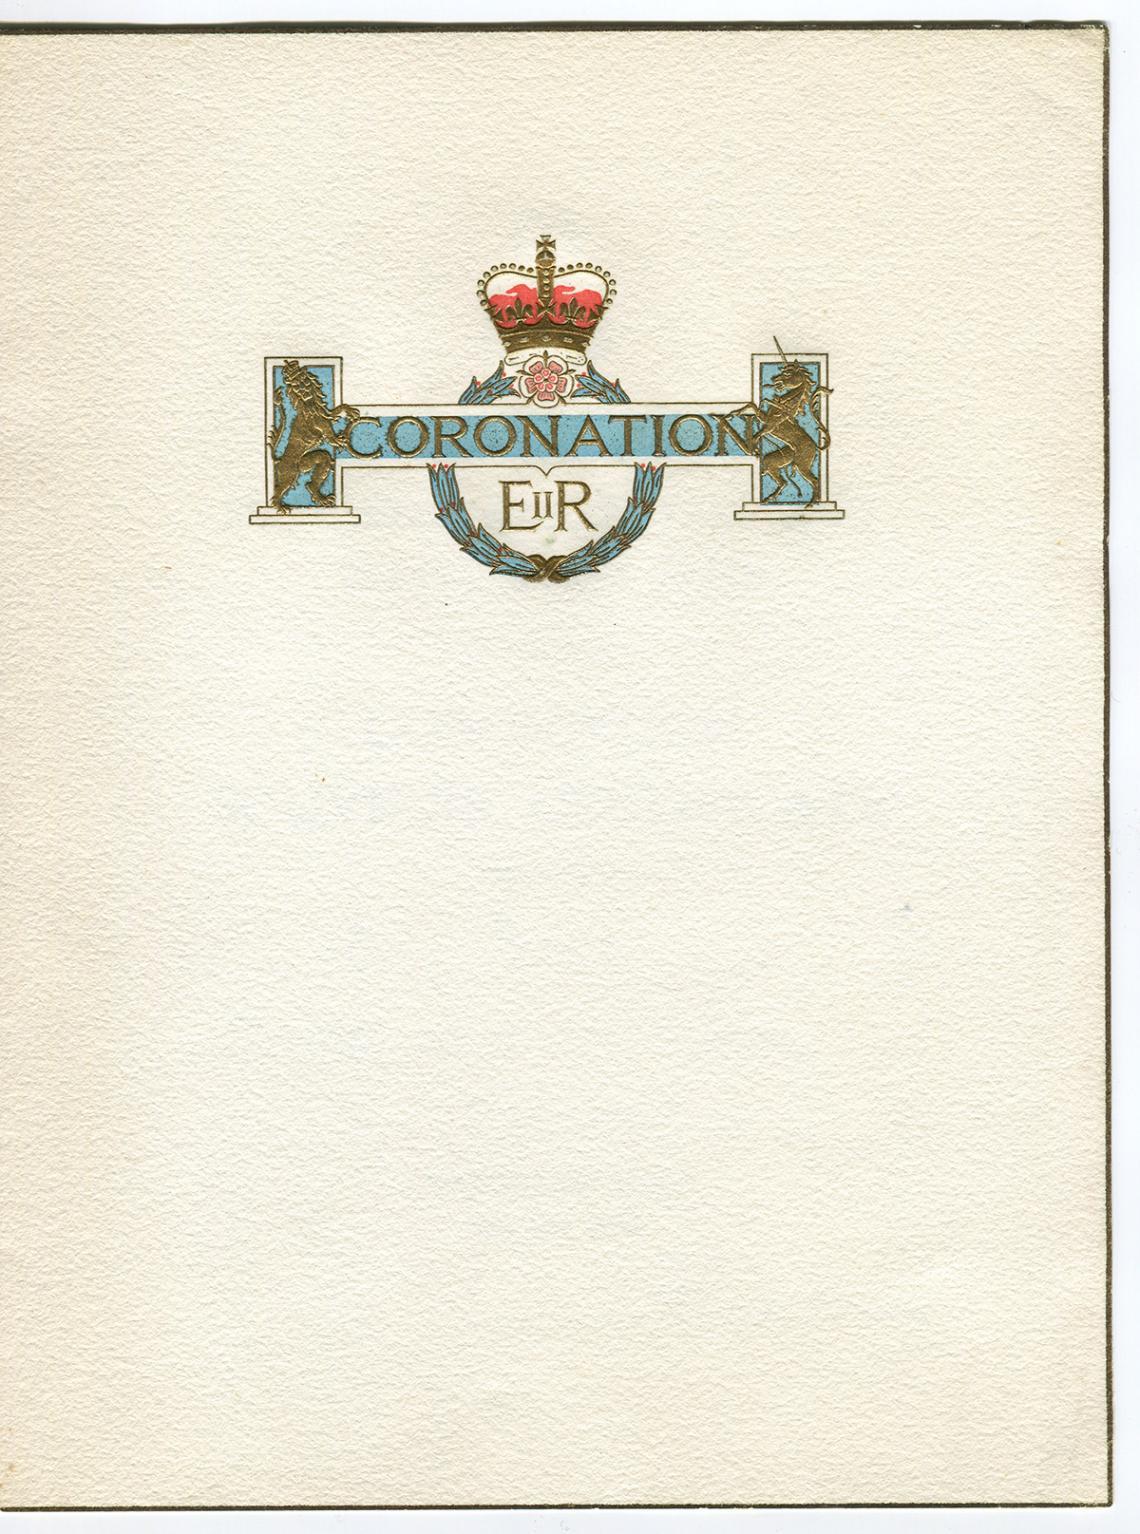 Coronation souvenir certificate